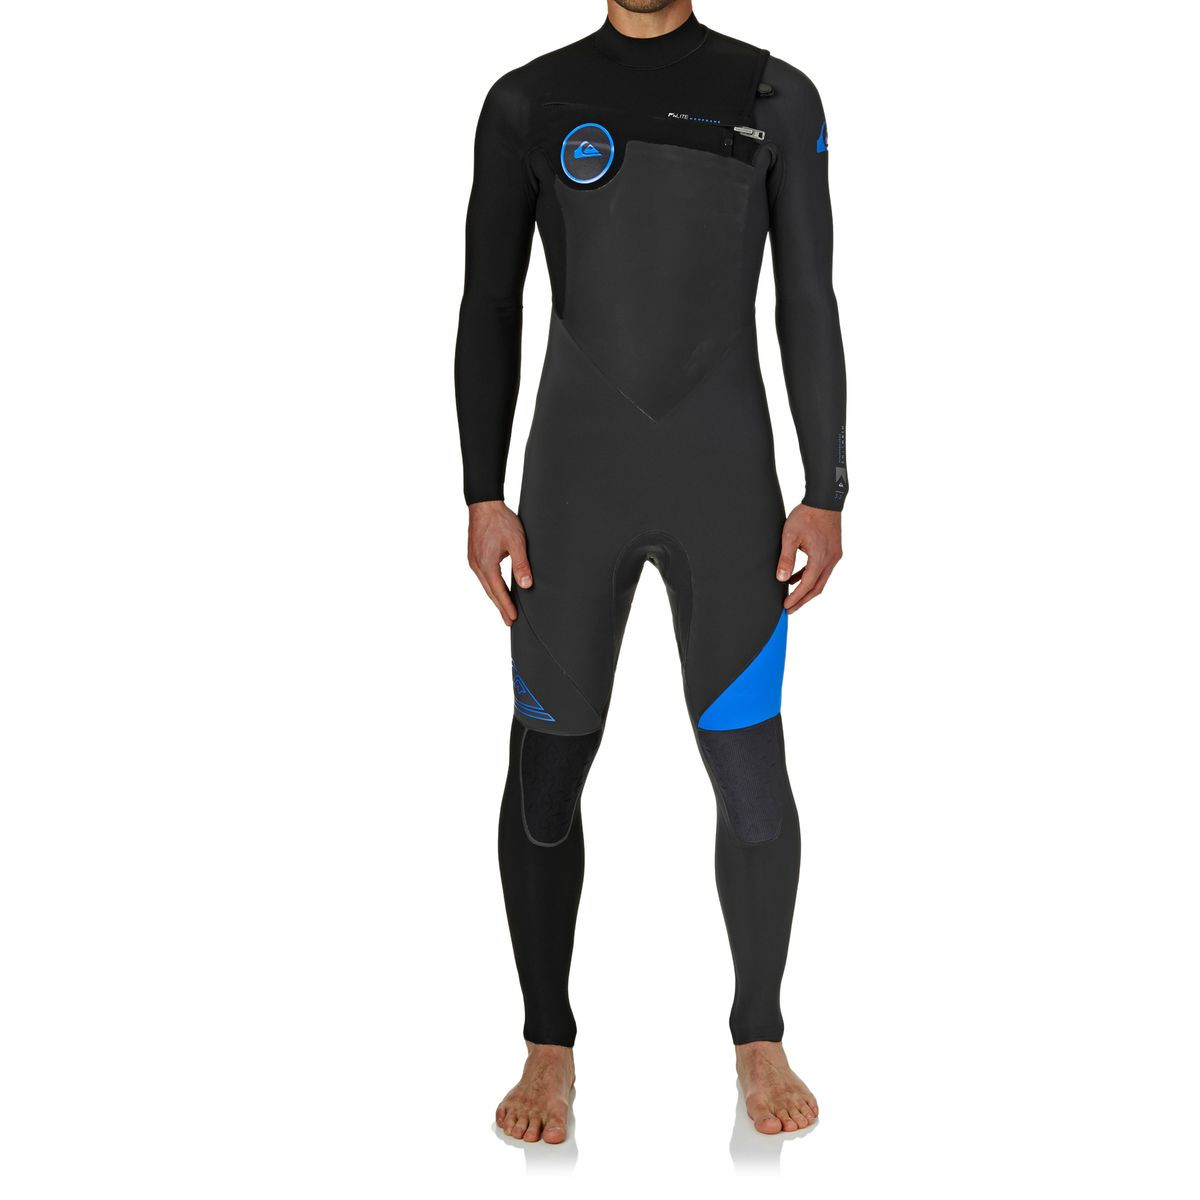 Quiksilver Highline Performance 3/2mm Chest Zip Wetsuit - Graphite/ Cyan